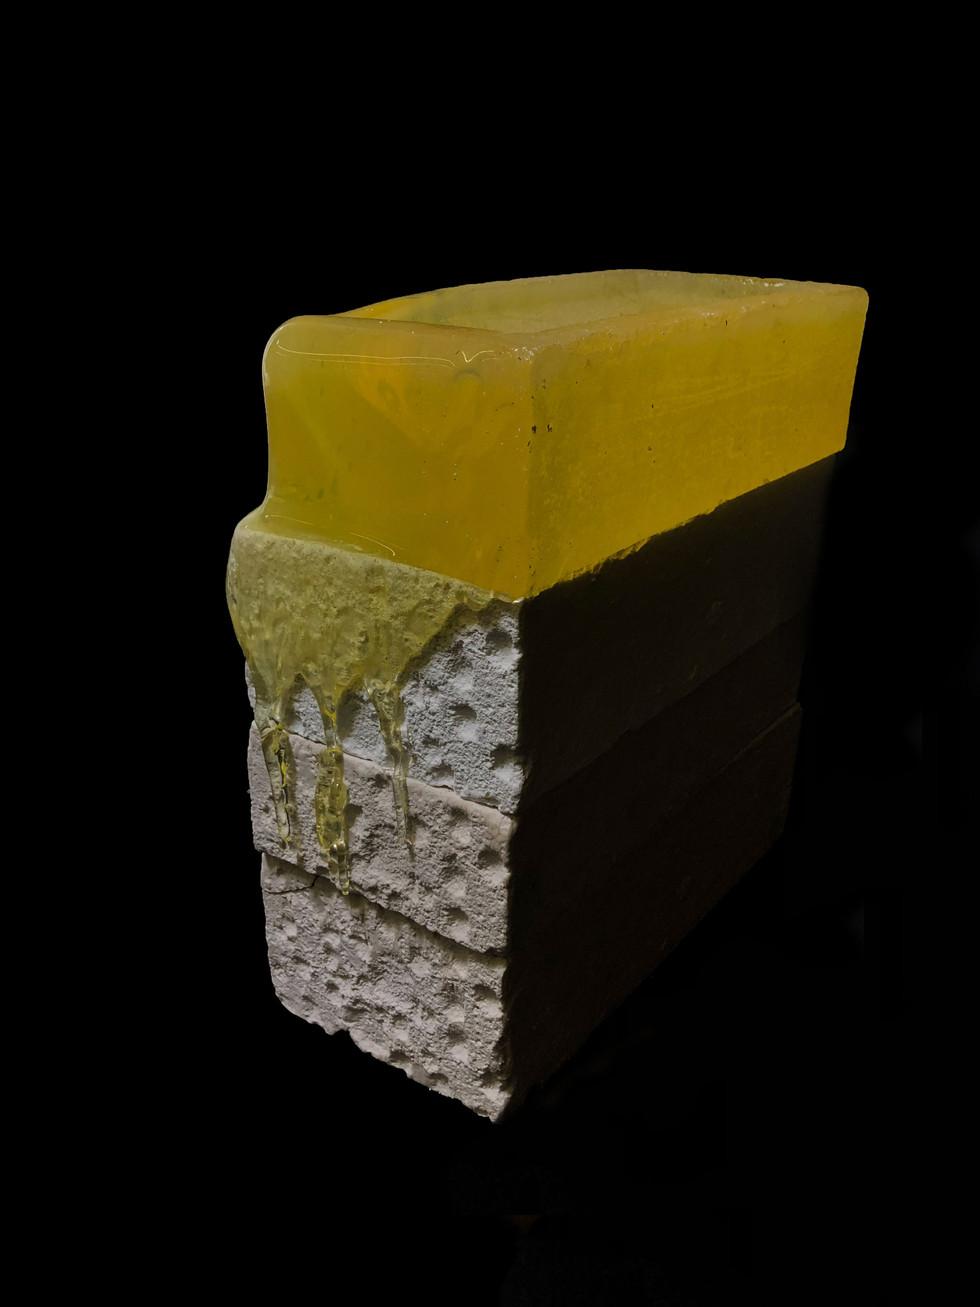 Melted brick 1 - 2019